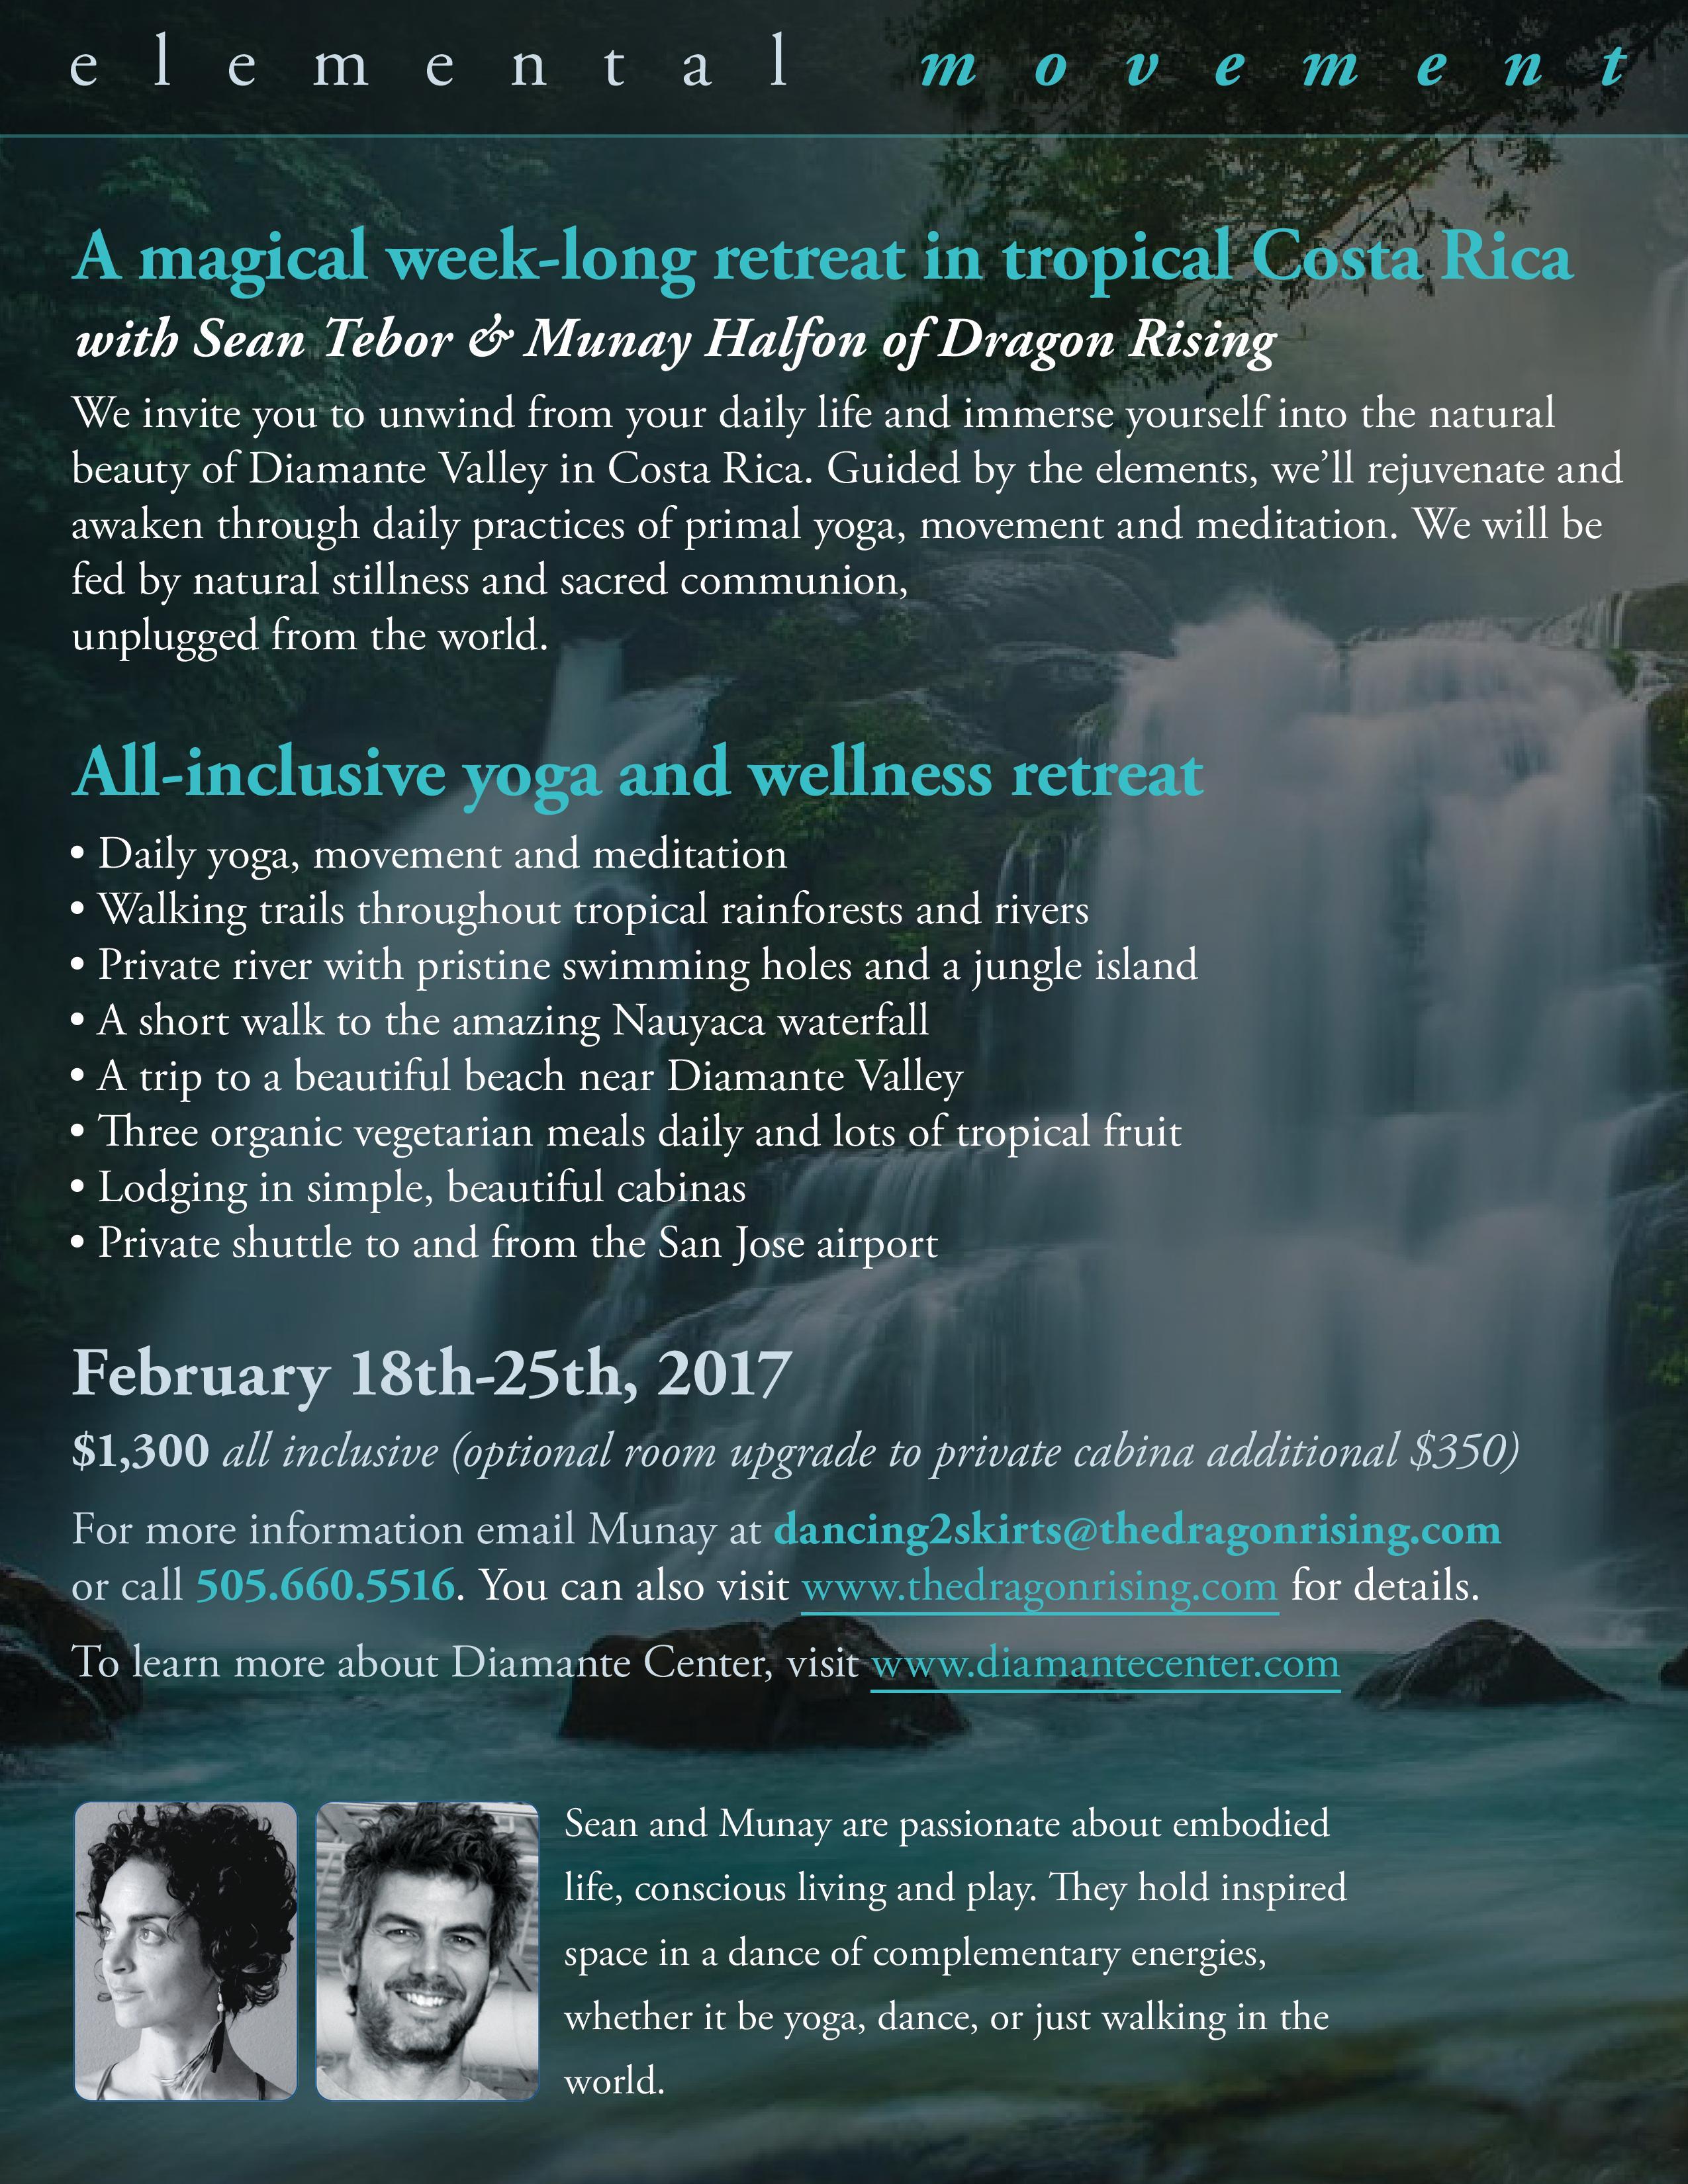 Elemental Movement - FULL - Diamante Center Retreat